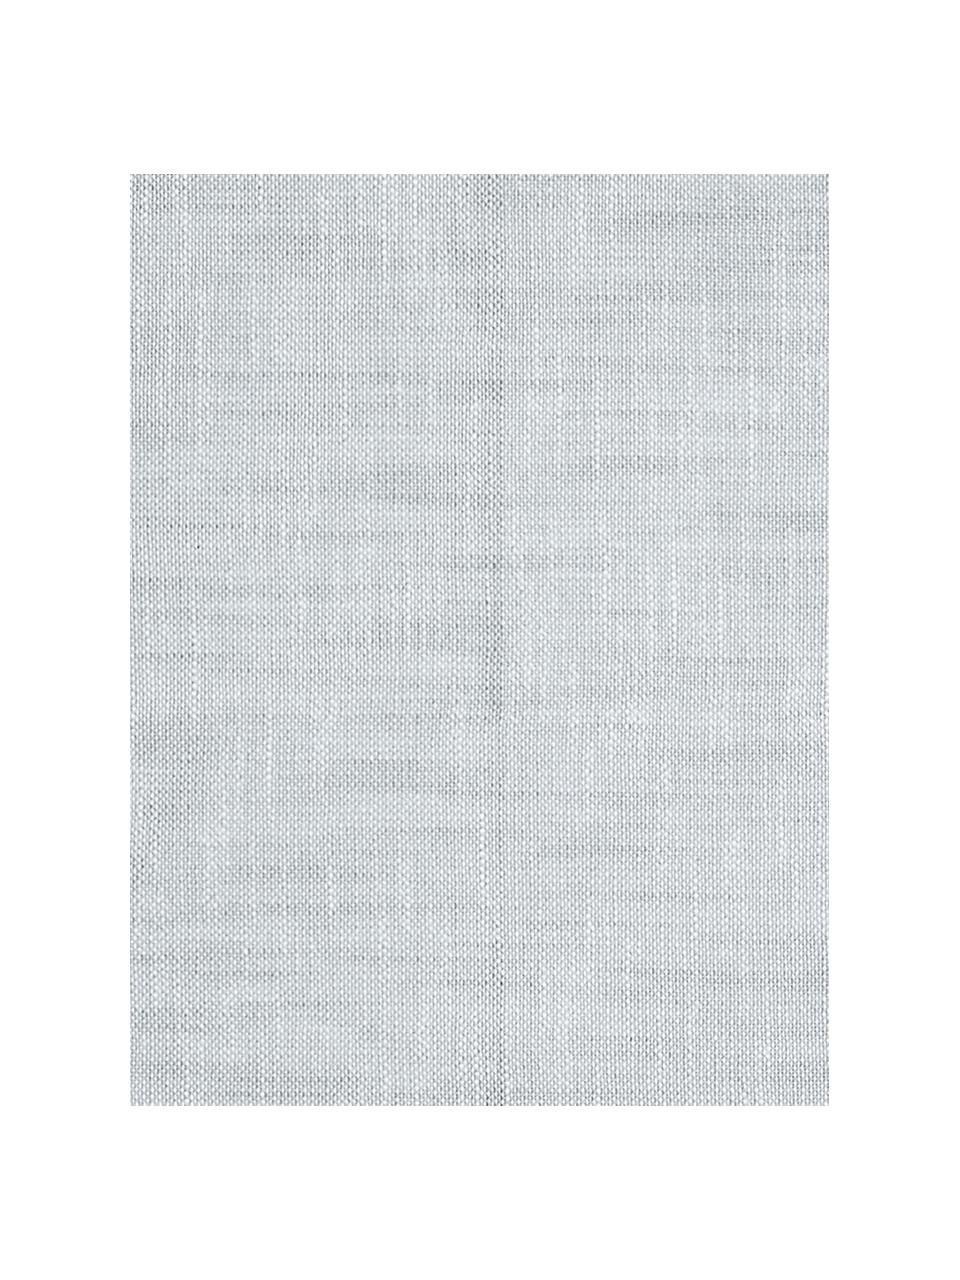 Stoff-Servietten Tonnika, 4 Stück, Baumwolle, Blaugrau, 45 x 45 cm